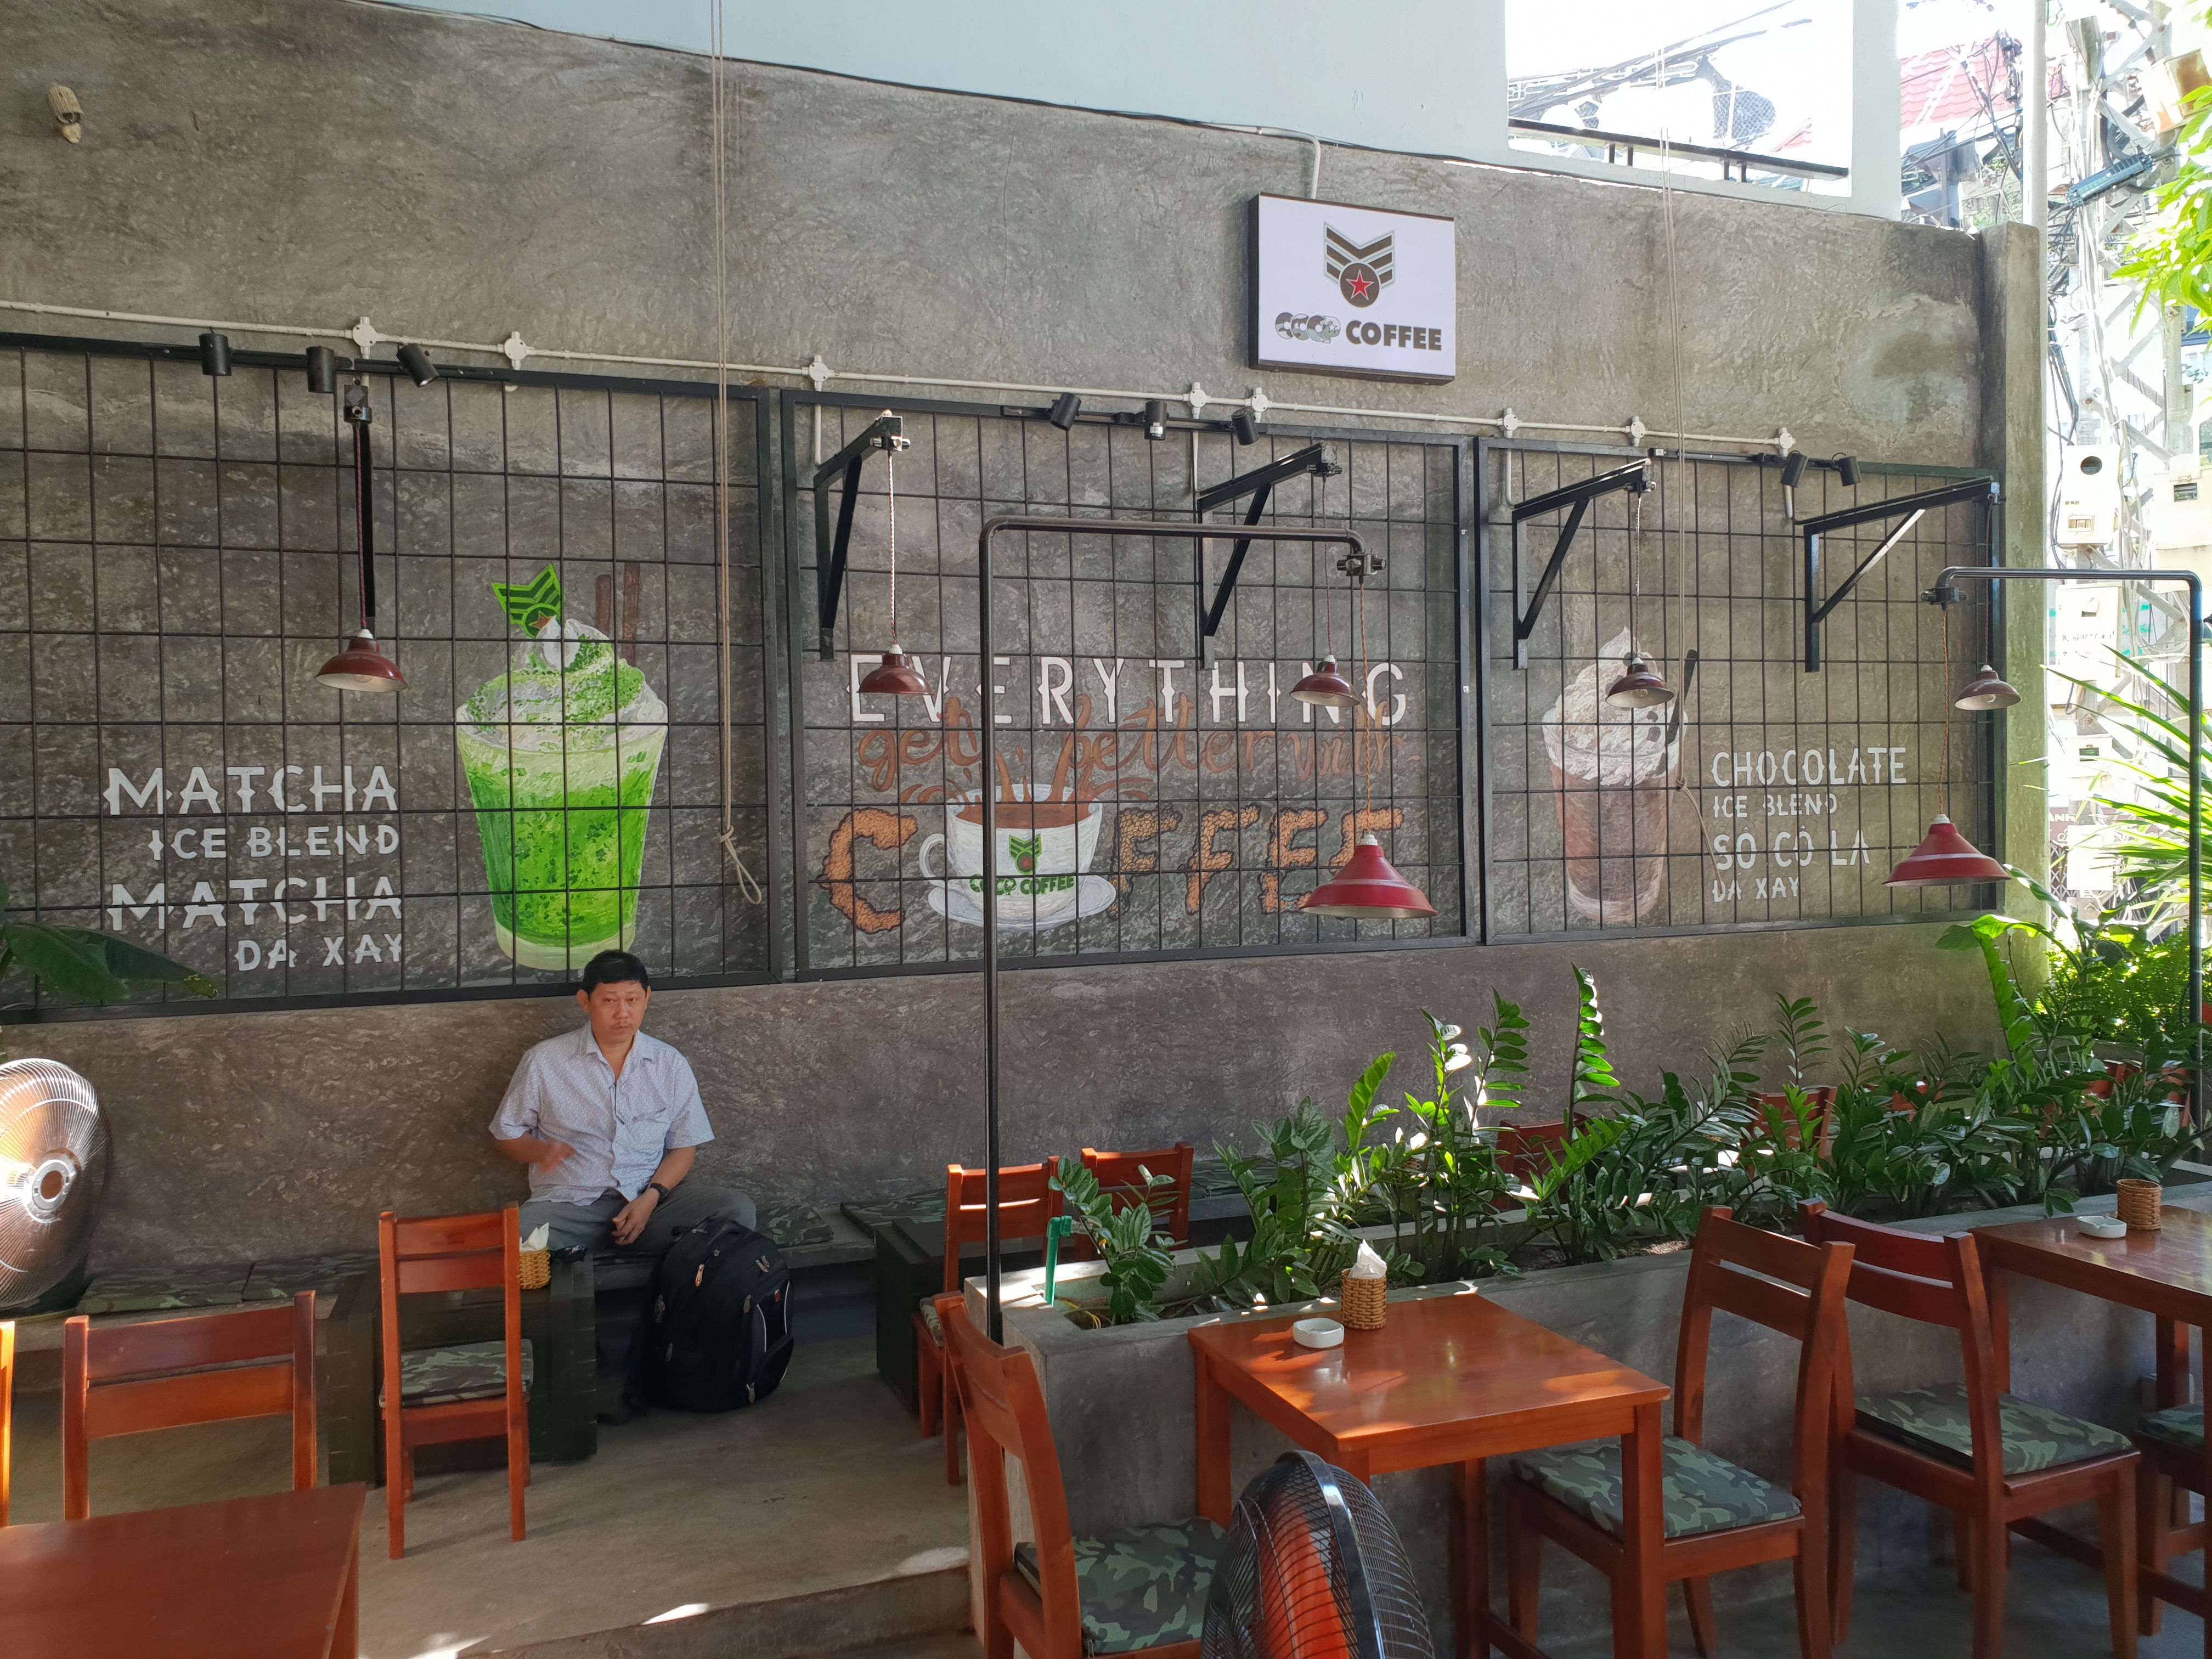 bac xiu, cafe den, cccp 가격, cccp 메뉴, cccp 메뉴판, cccp 카페, cccp 커피, [베트남 나짱] CCCP 카페 - 미니 쿠퍼 컨셉인듯, 나짱 cccp 카페, 나짱 cccp 커피, 나짱 카페